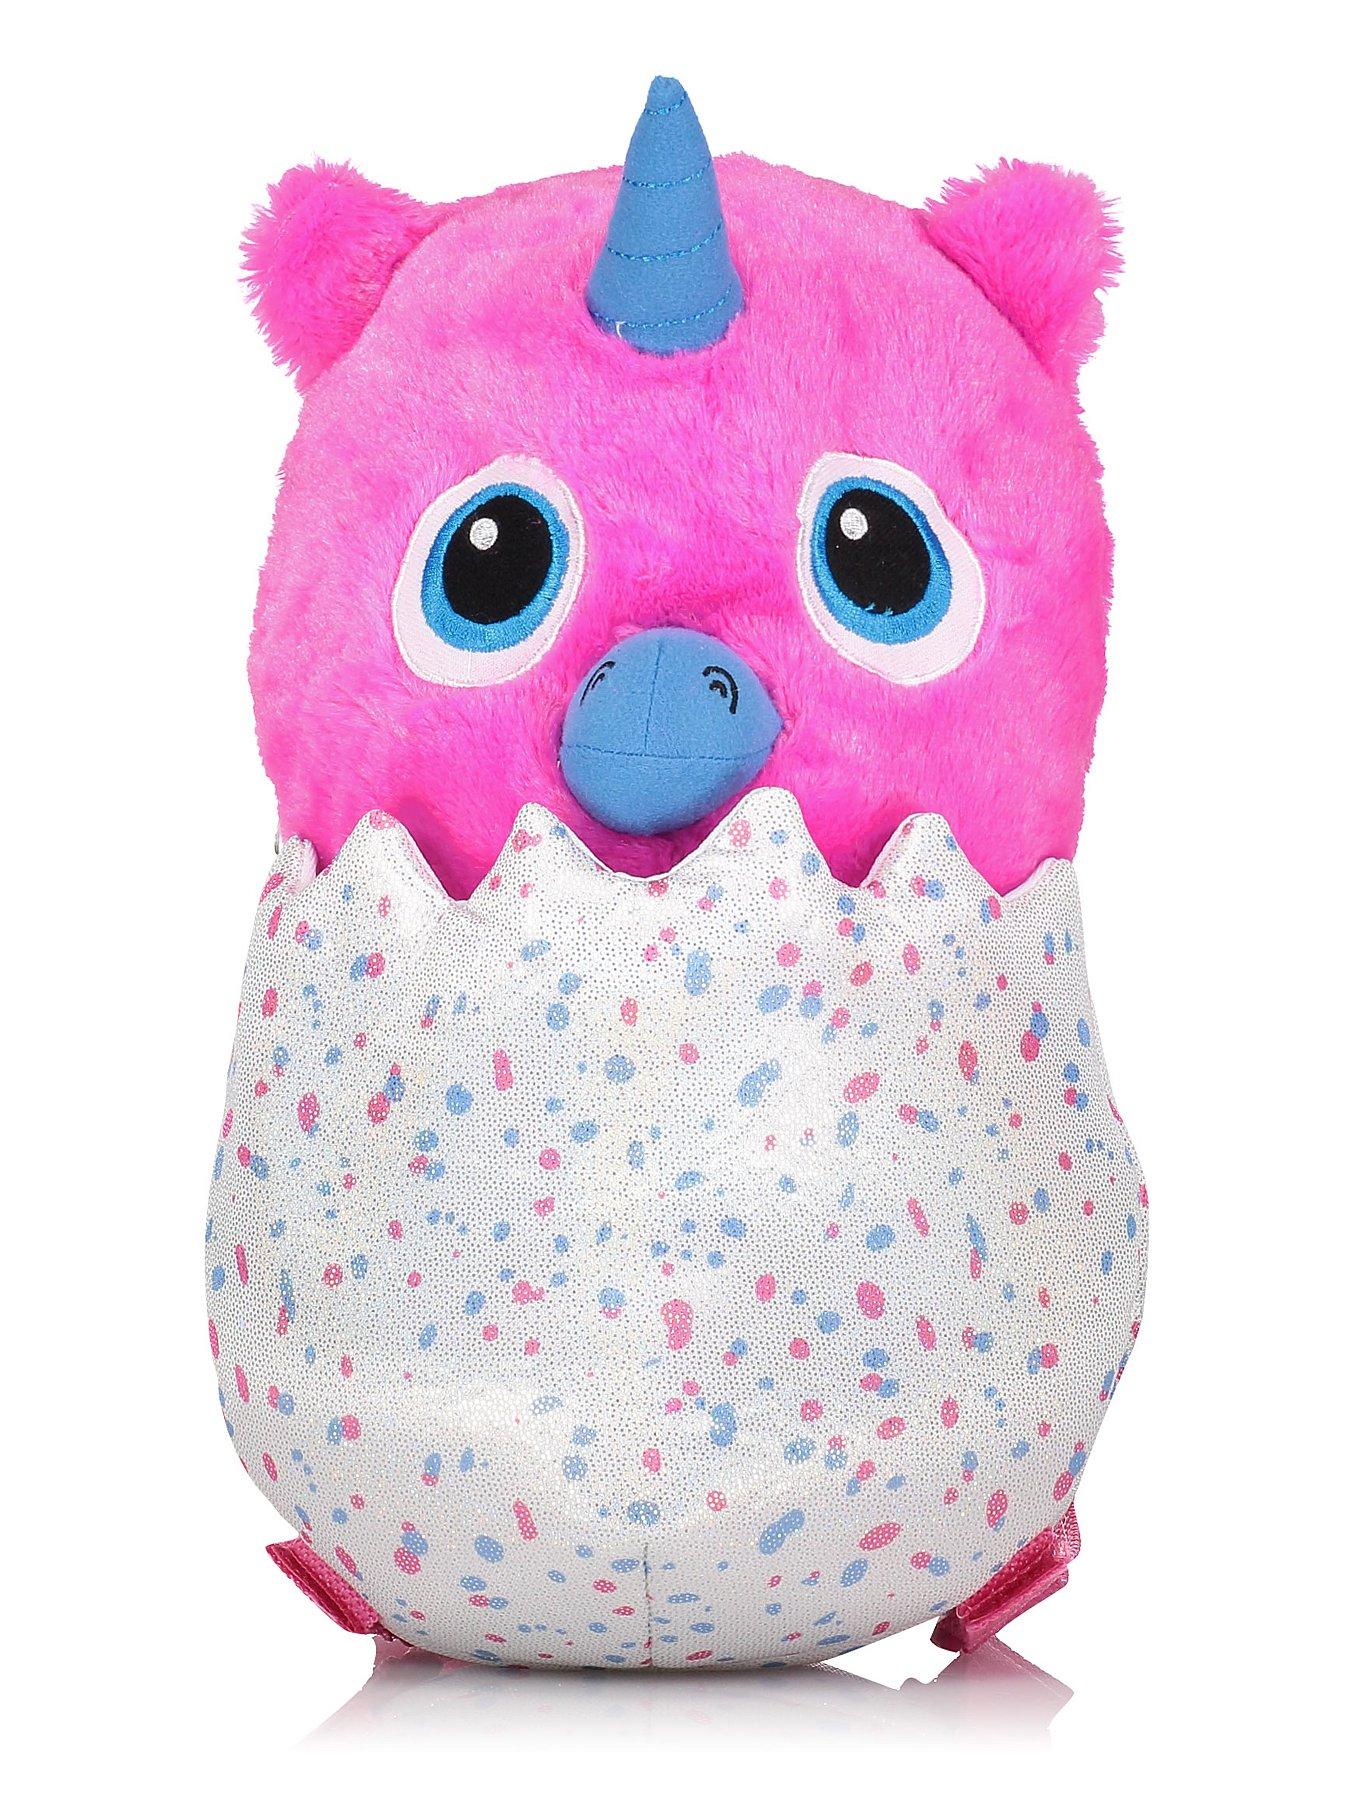 1/2 Price : Hatchimals Owlicorn Pink Plush Backpack Bag, Now £6 @ Asda (Free C&C )